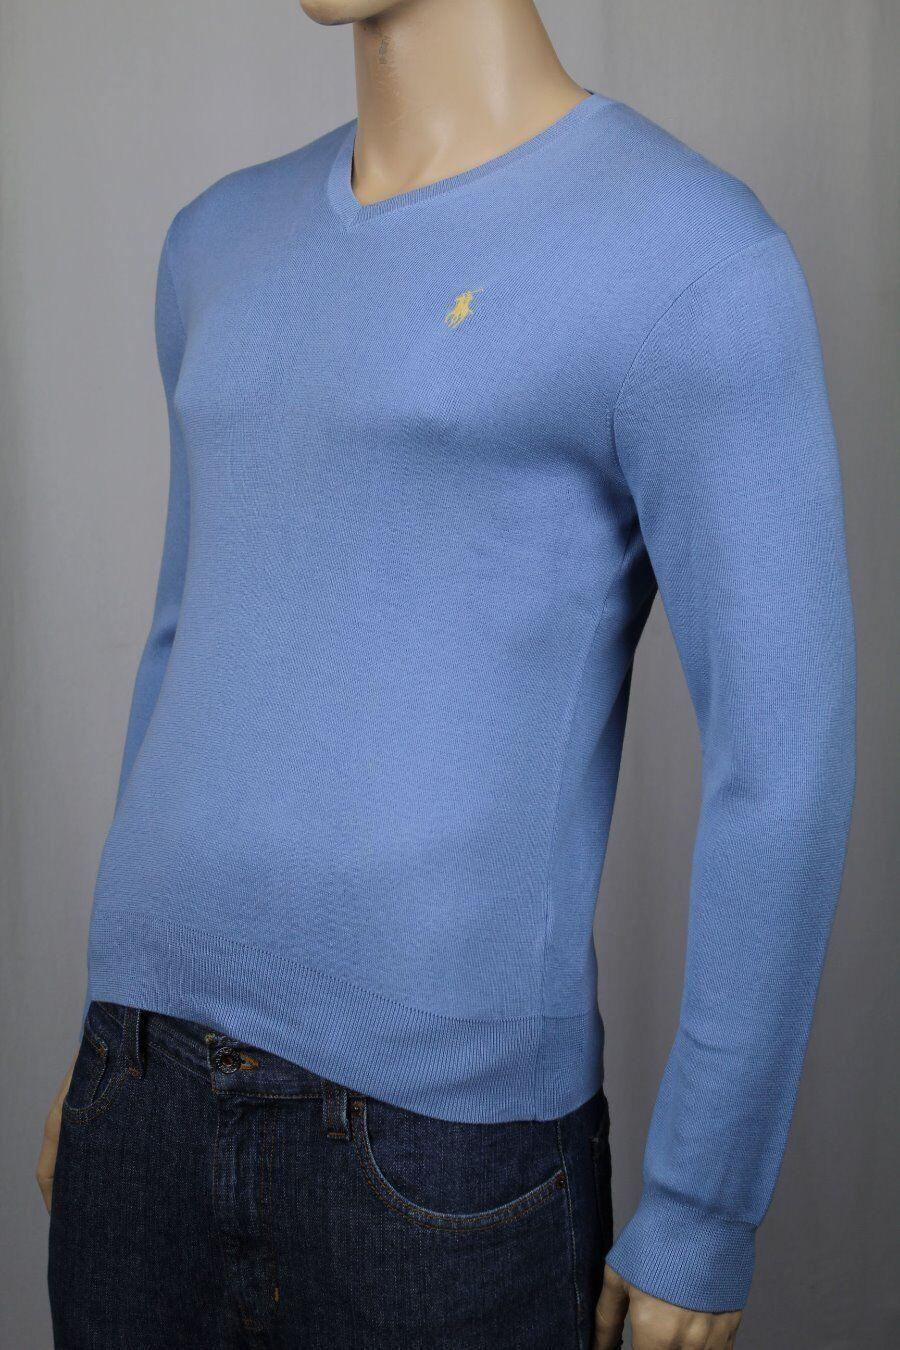 Polo Ralph Lauren bluee Pima Cotton Sweater Yellow Pony NWT